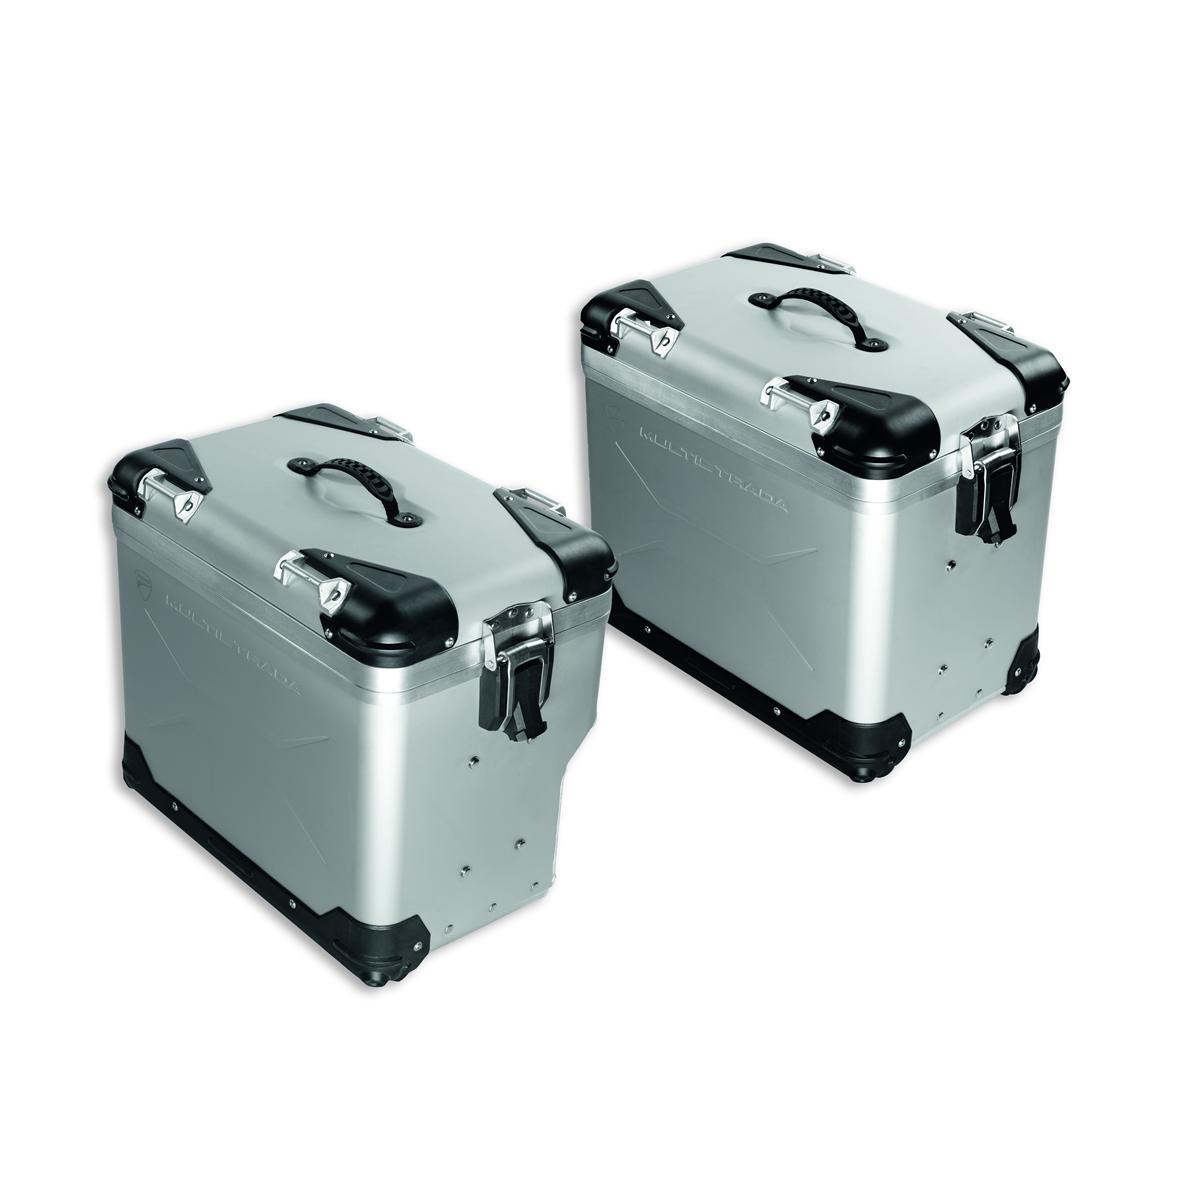 Aluminium side panniers.